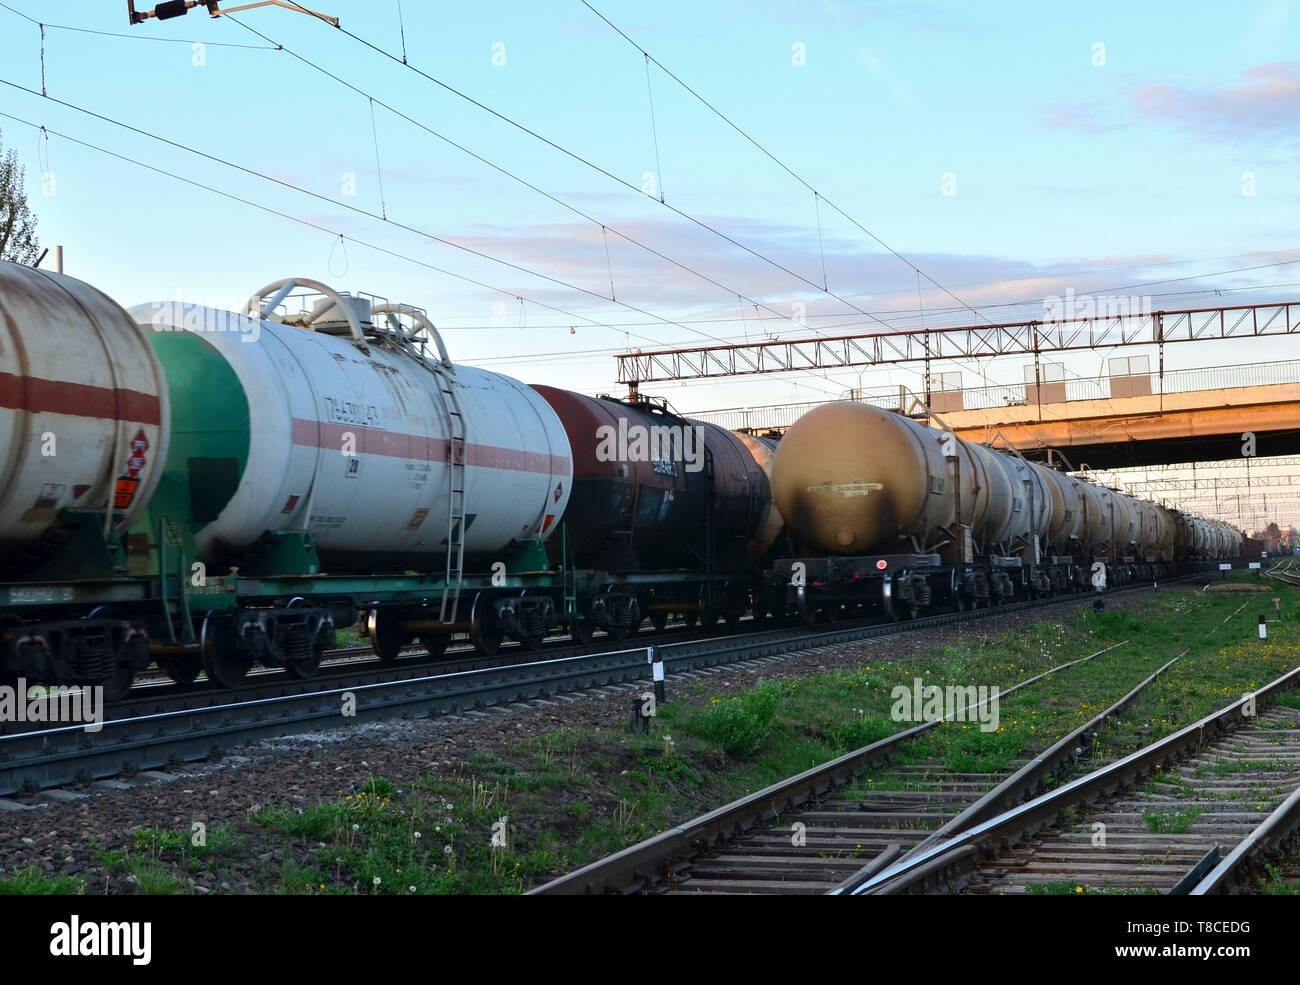 Rail cars carry crude oil and ethanol  Railway logistics explosive